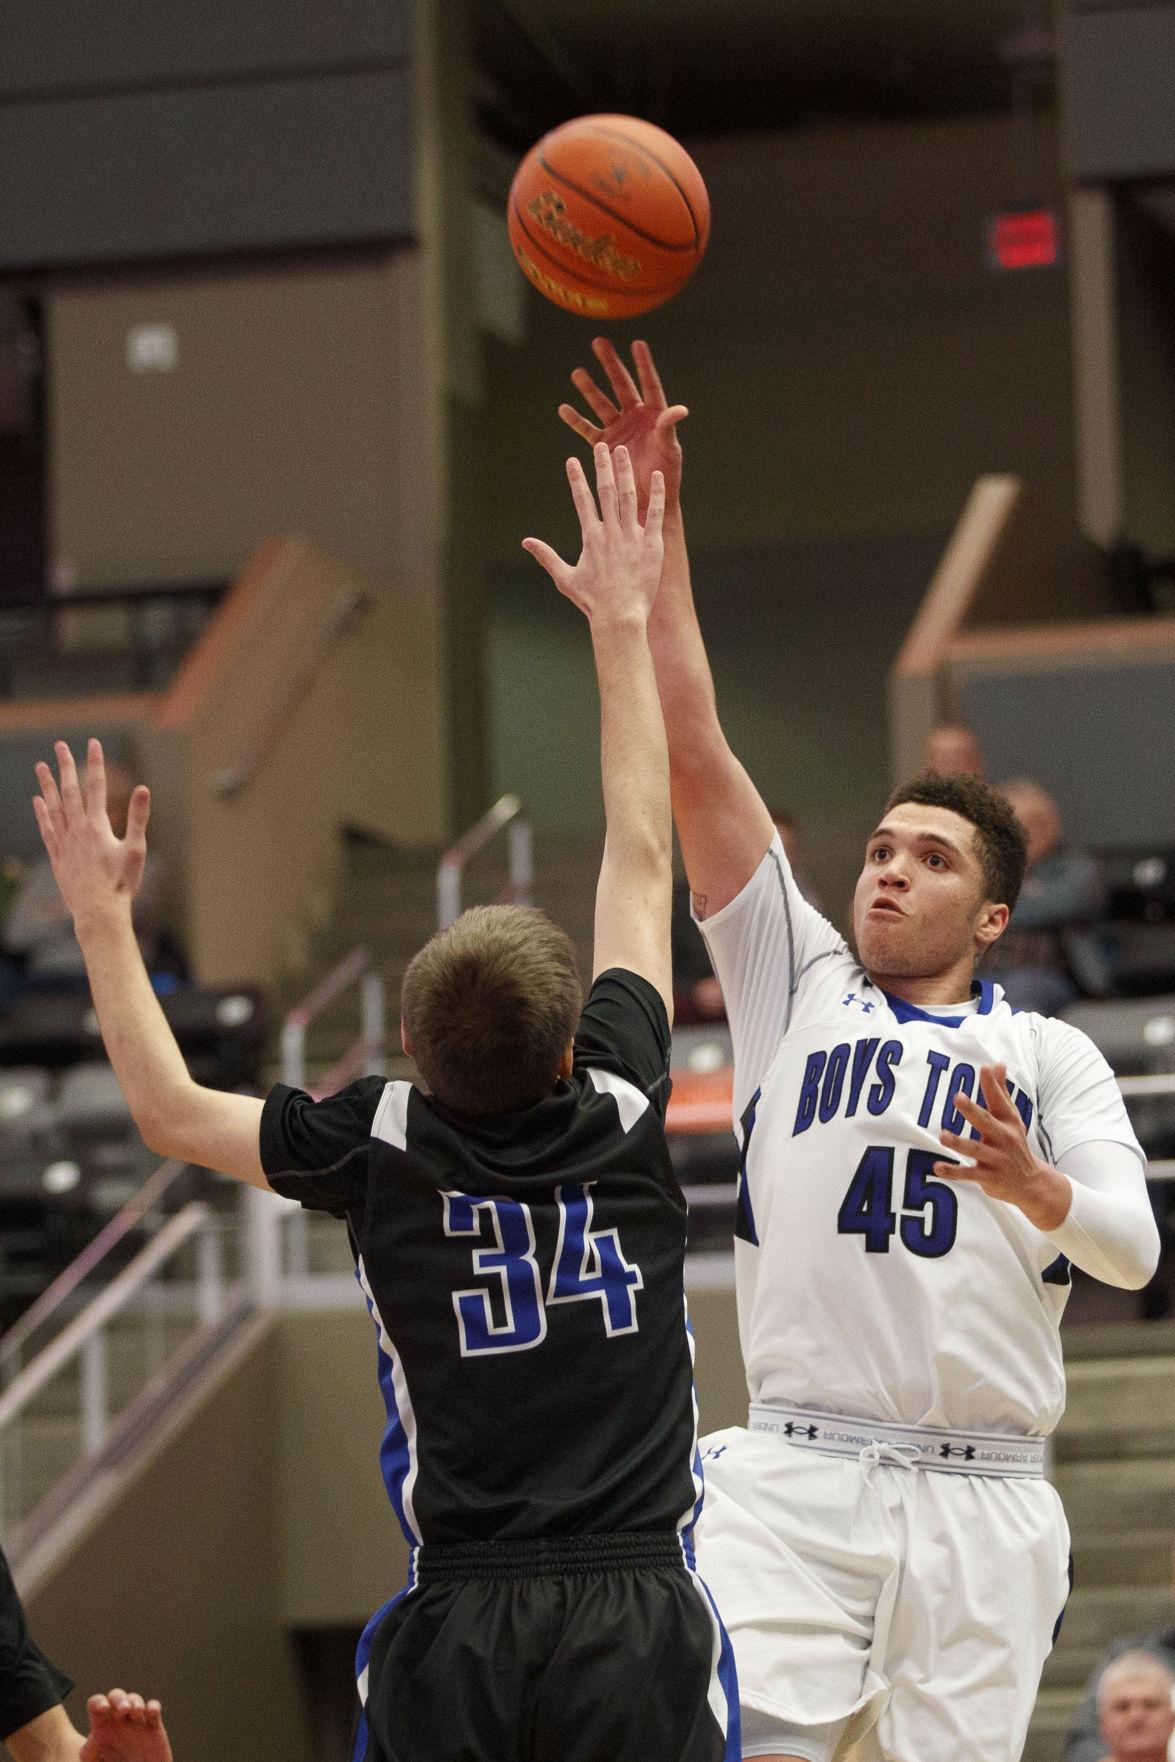 Nebraska boys state basketball tournament information | Basketball ...